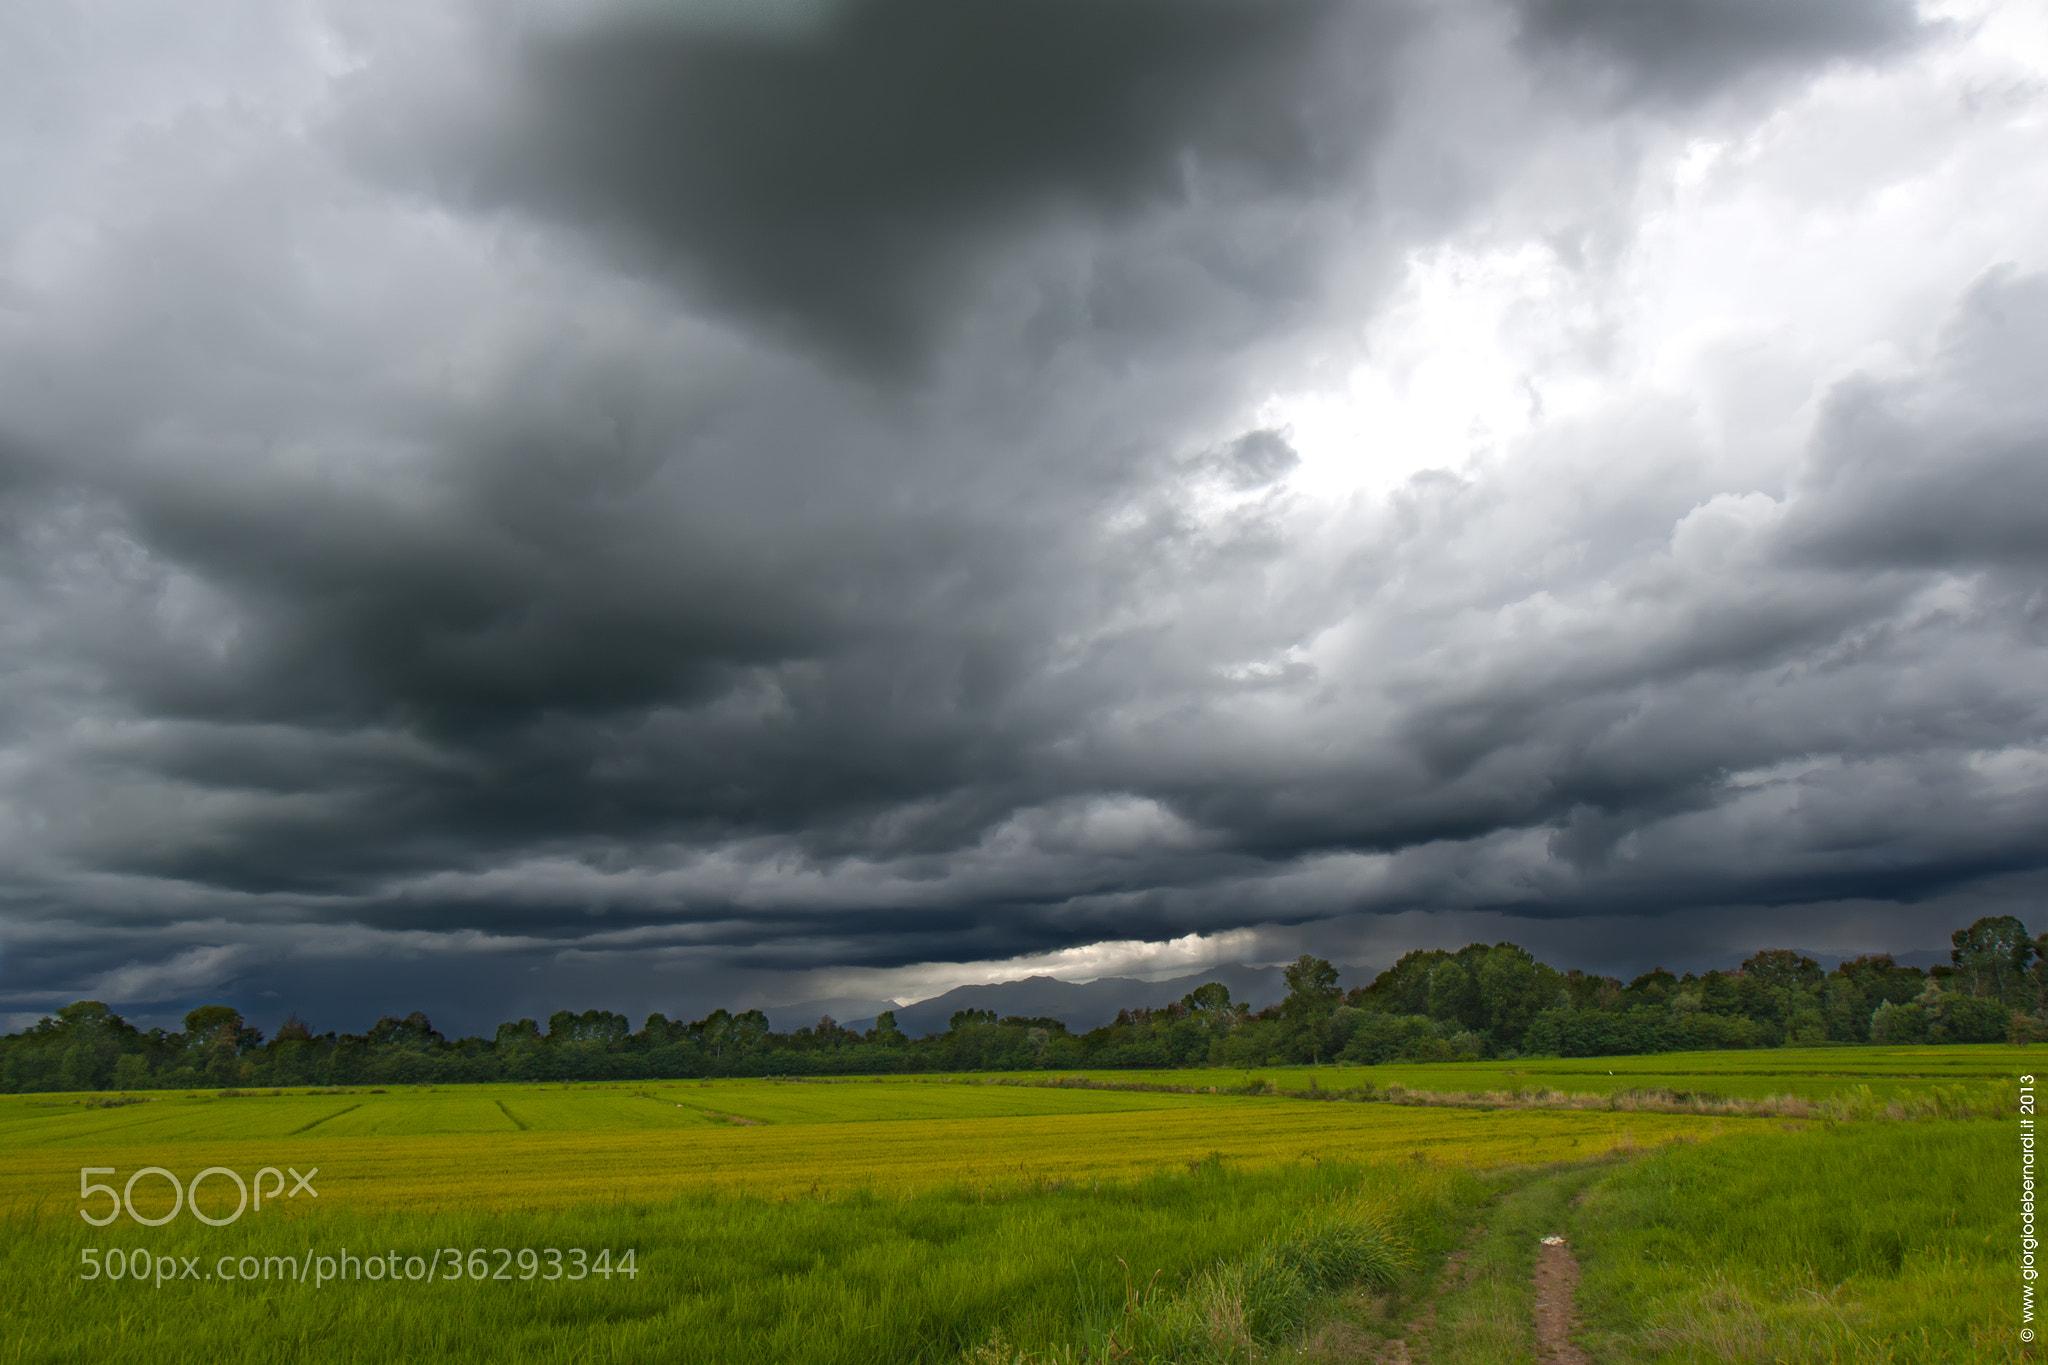 Photograph Thunderstorm  by giorgio debernardi on 500px